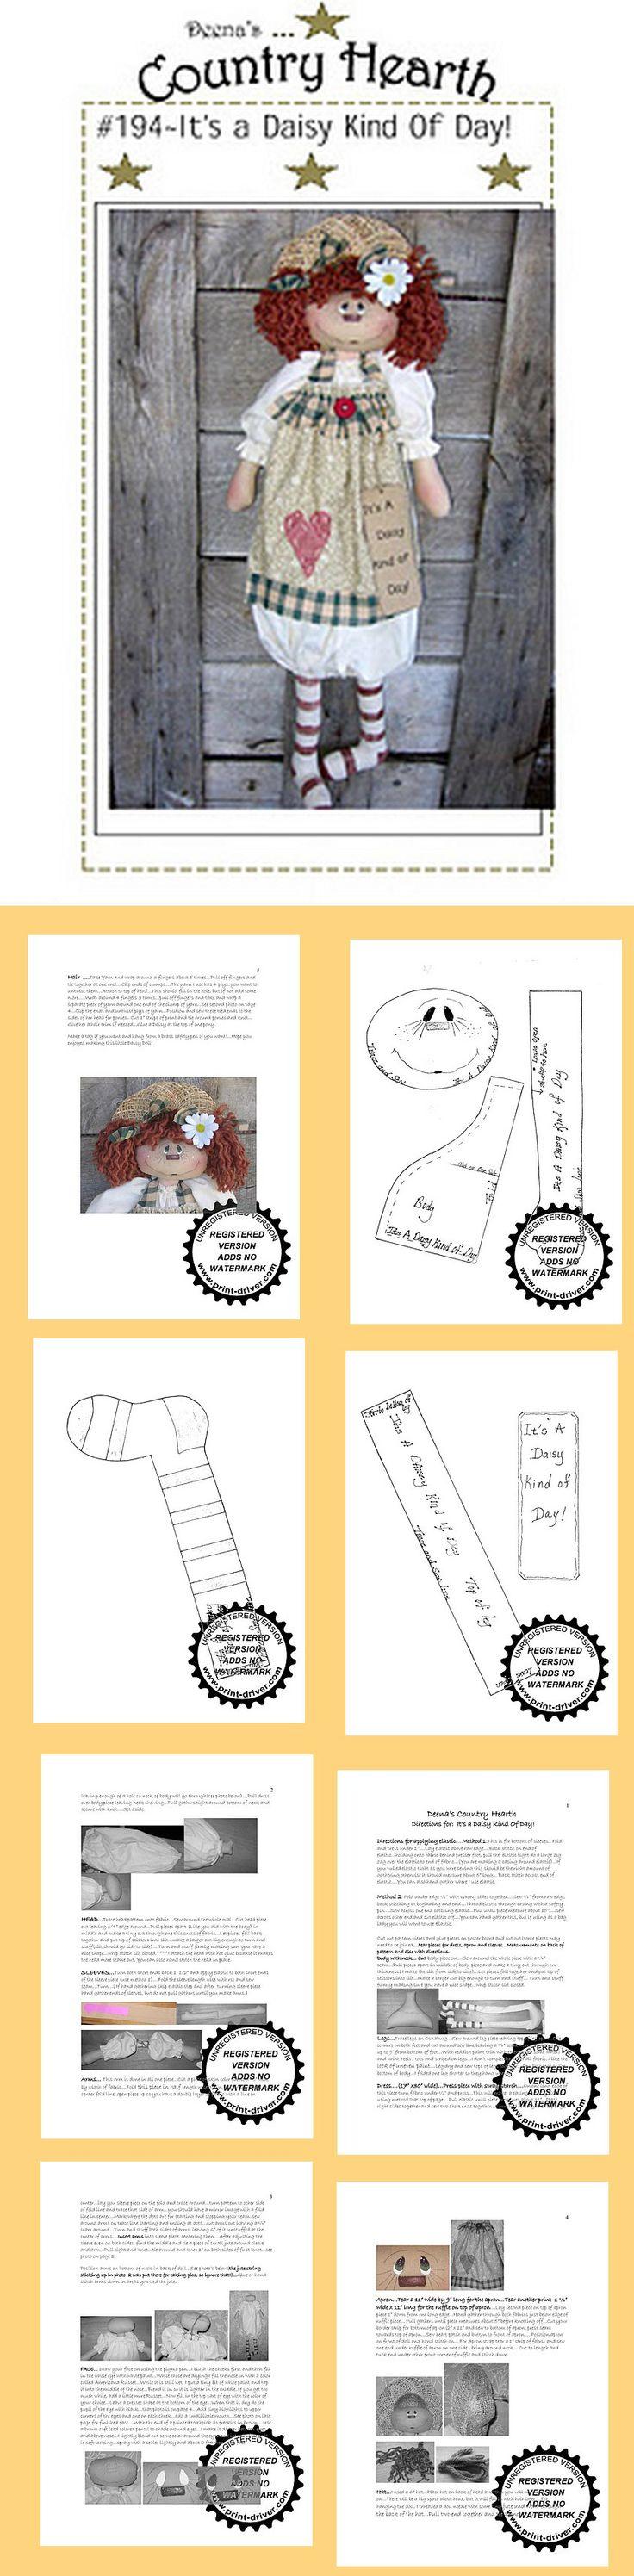 https://www.pinterest.com/marialao/patterns-tutorials-cloth-dolls-wood-dolls/